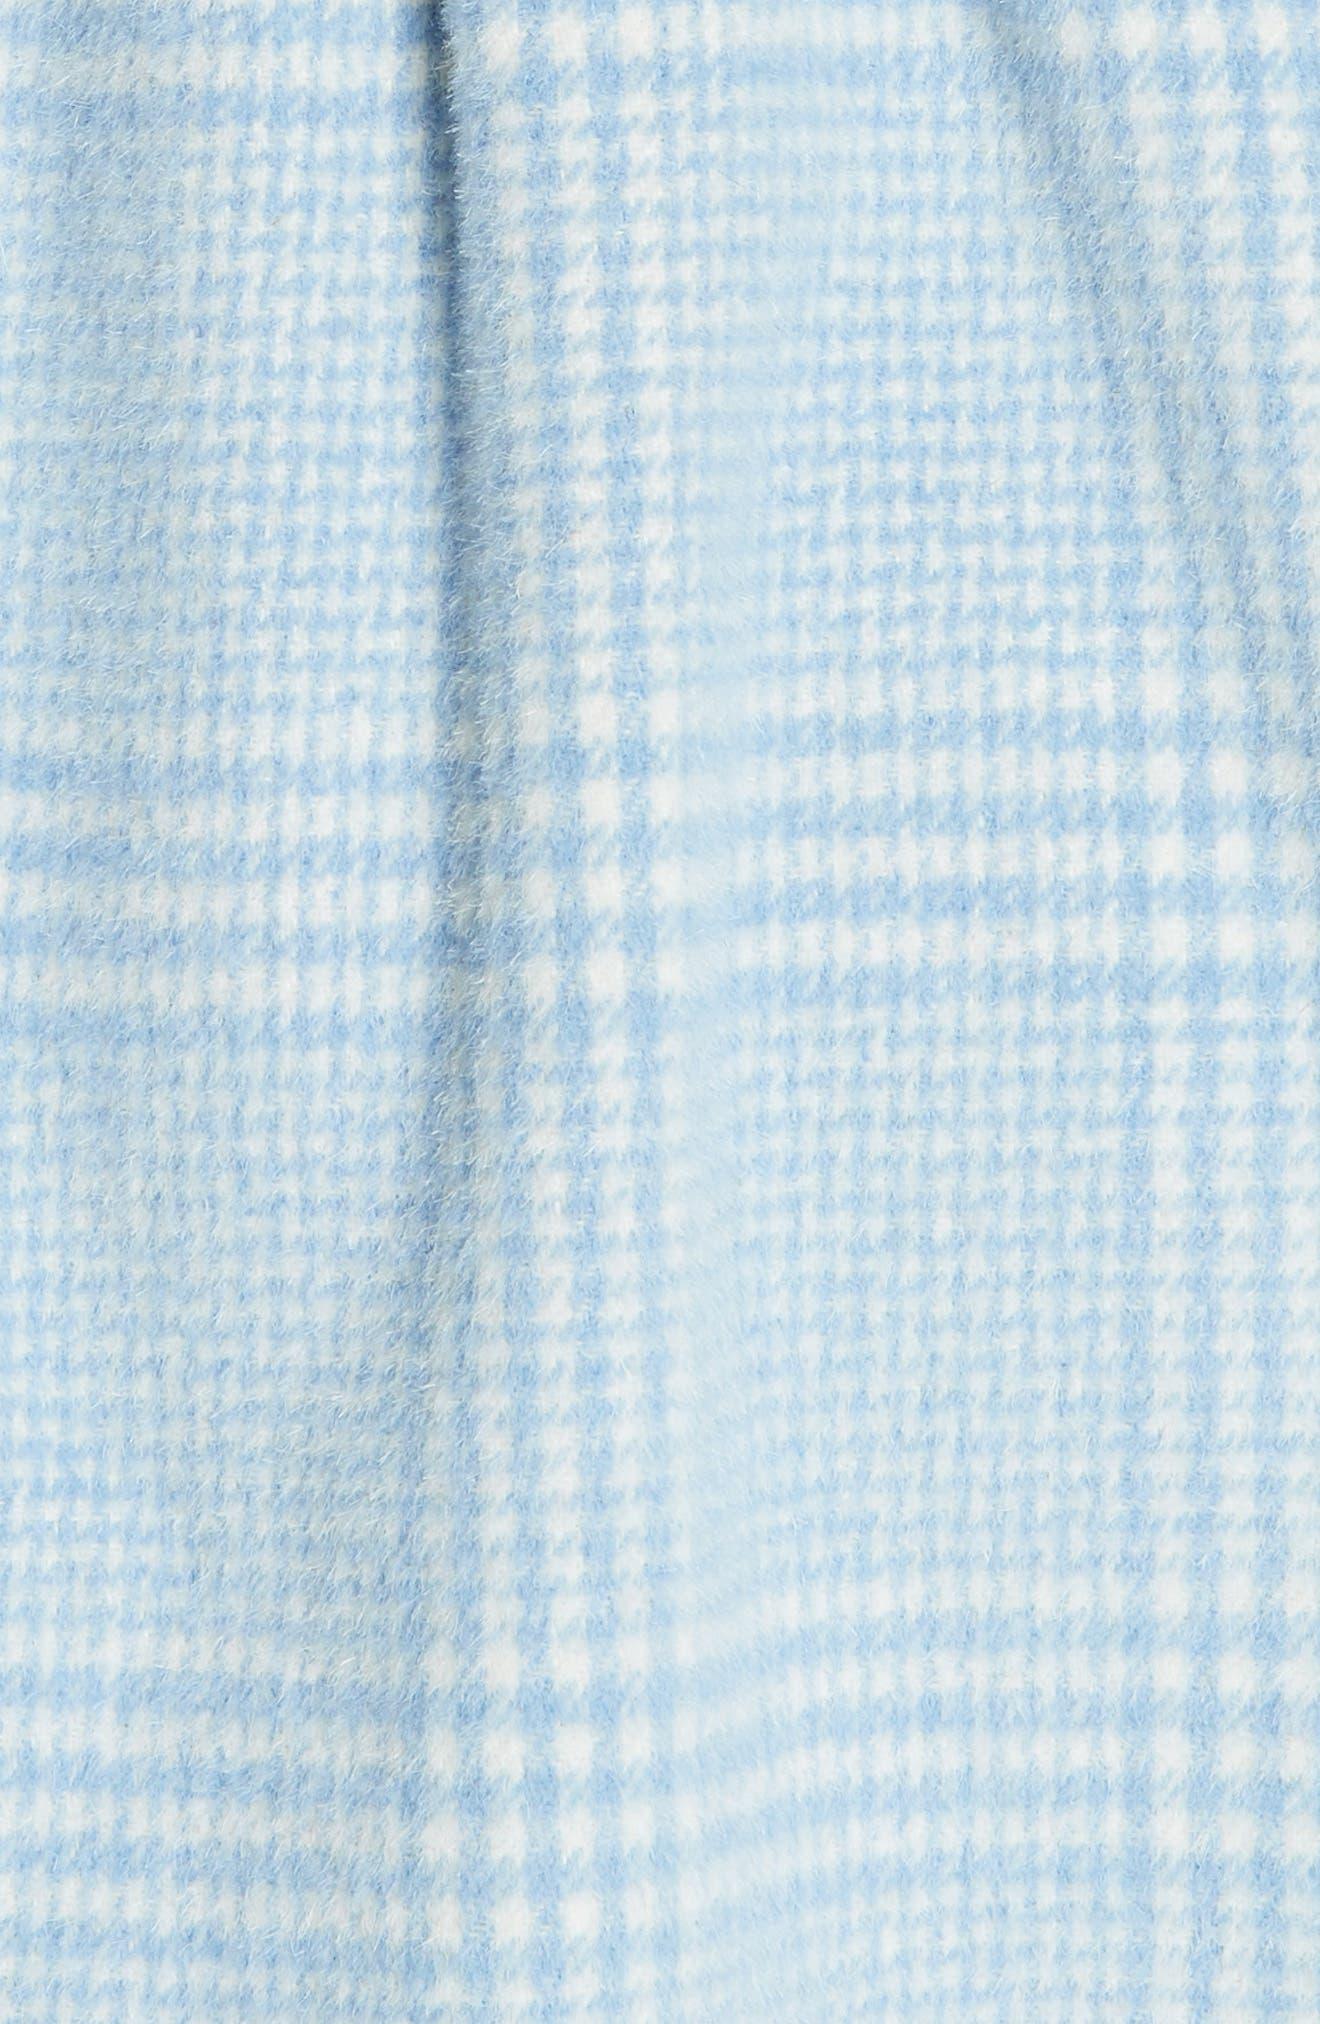 Woodside Coat,                             Alternate thumbnail 6, color,                             SERENITY BLUE